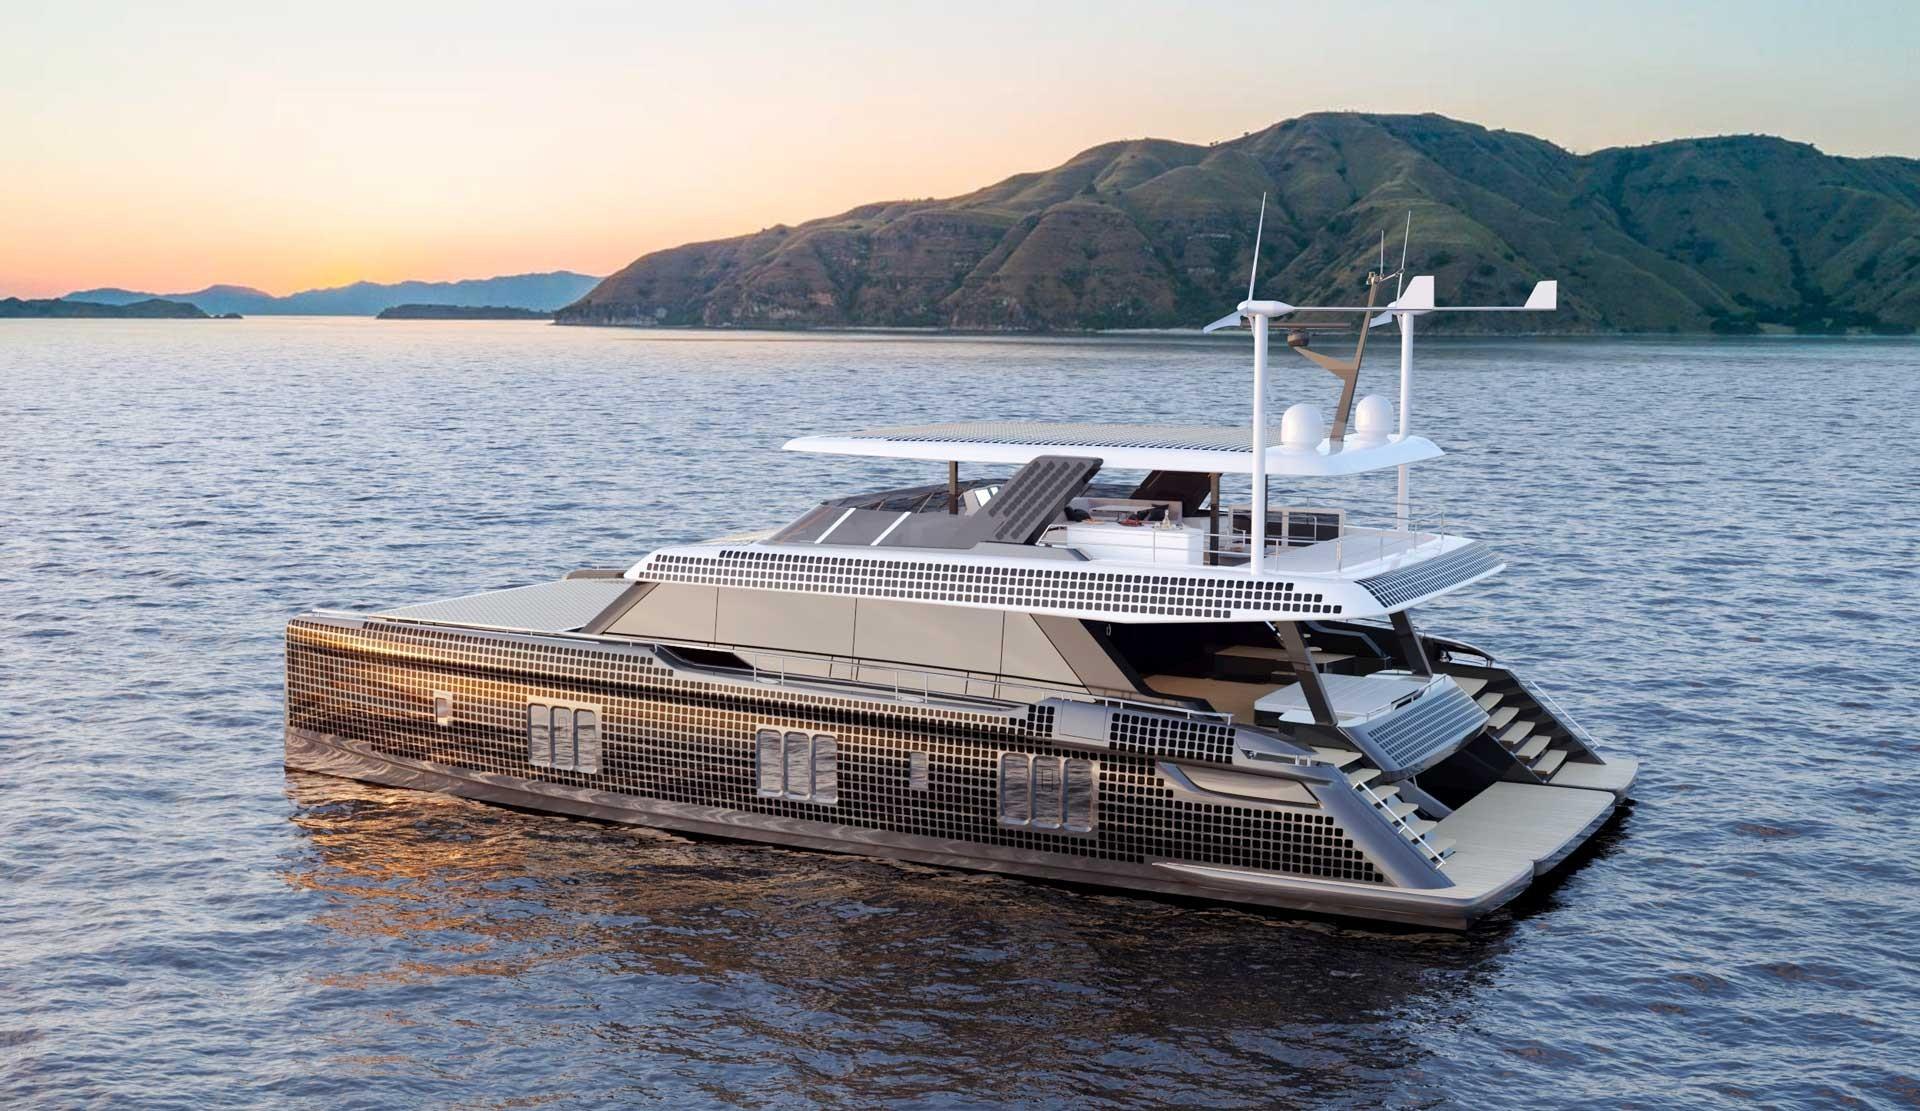 New Power Catamaran for Sale  Sunreef 80 Power Eco Boat Highlights